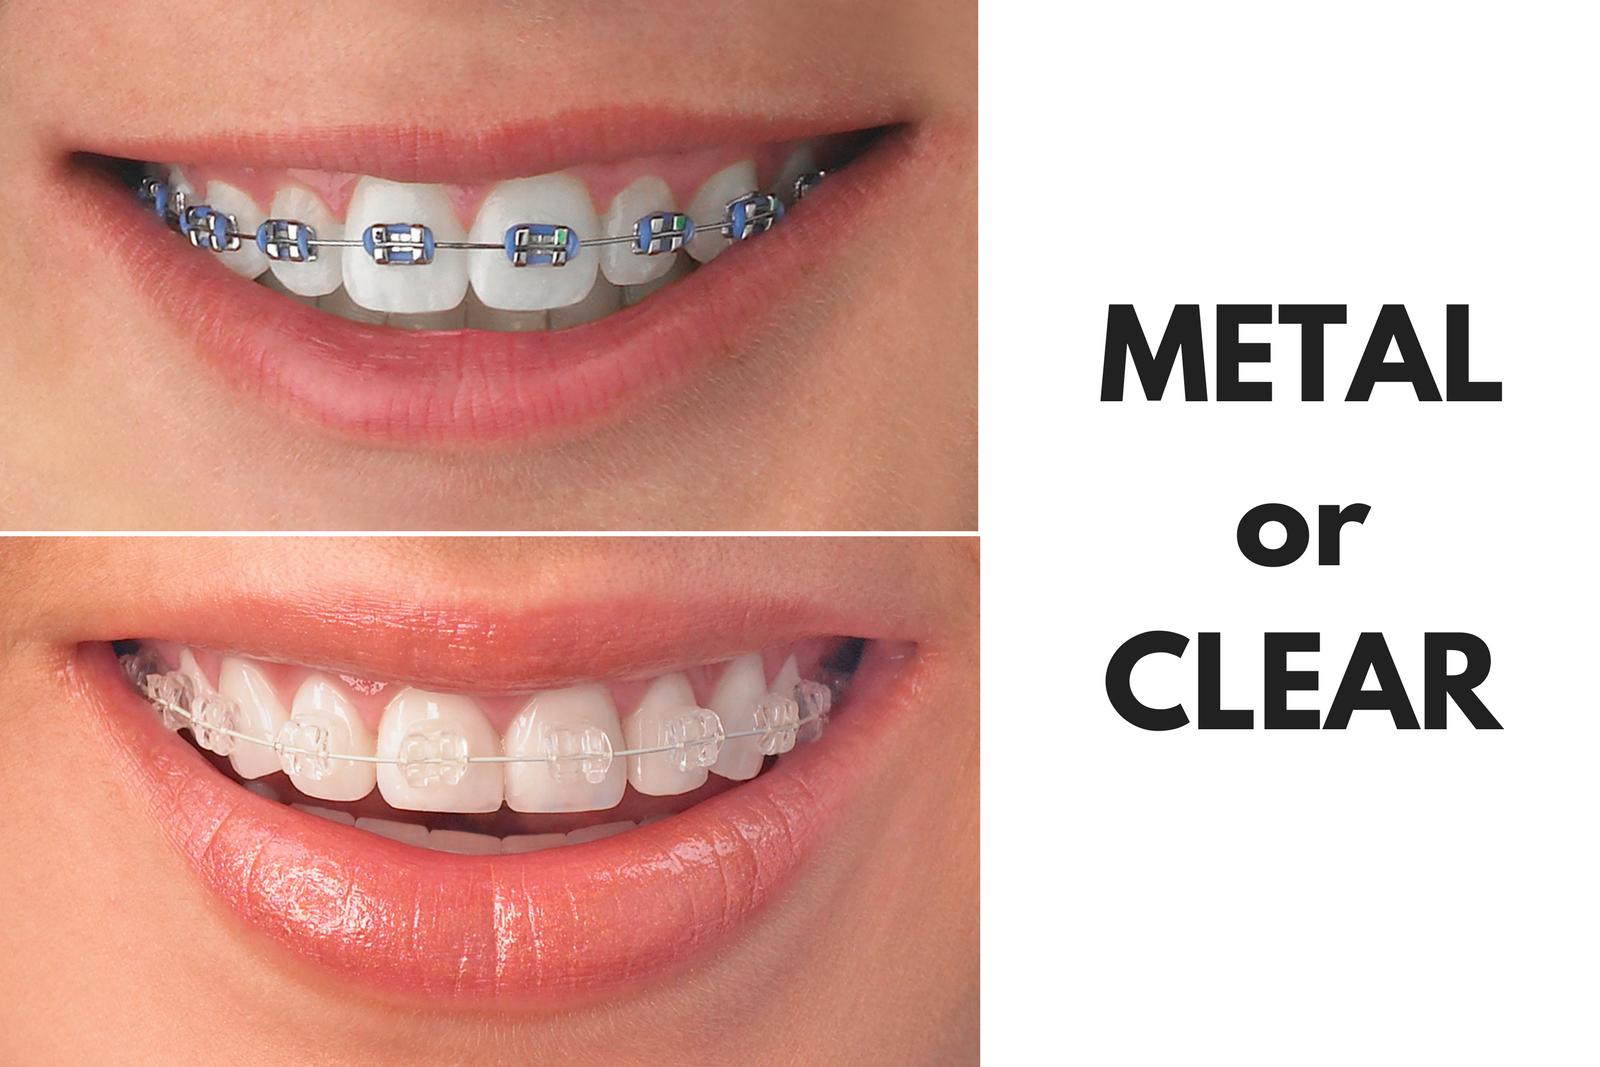 Ask Your Baytown, Deer Park, Pasadena or Pearland Dentist: Should I Get Metal or Clear Braces?